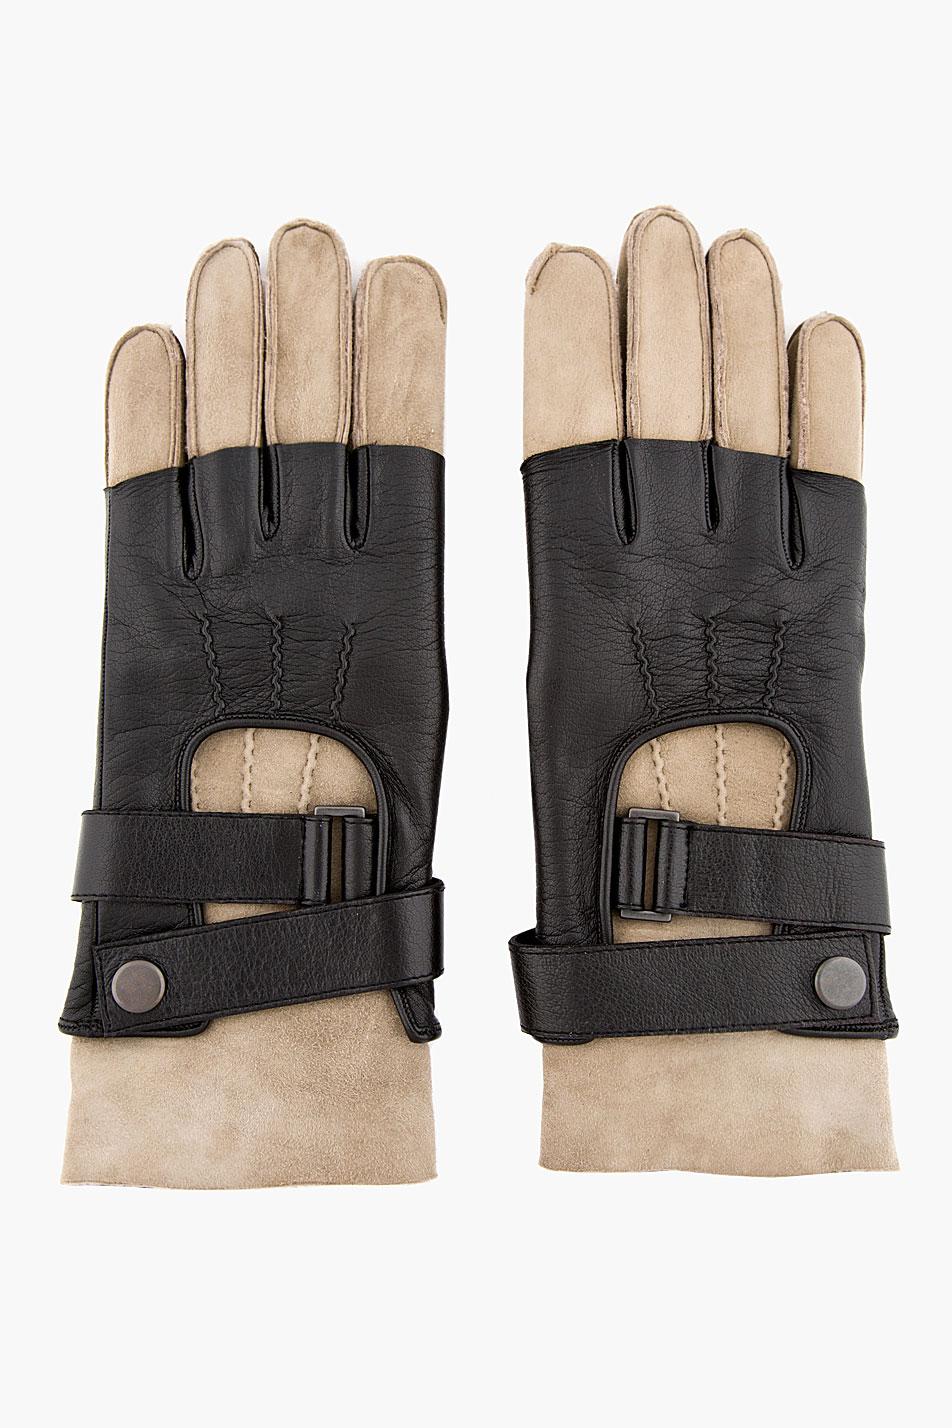 Half Finger Gloves balmain shearling leather two tone 1